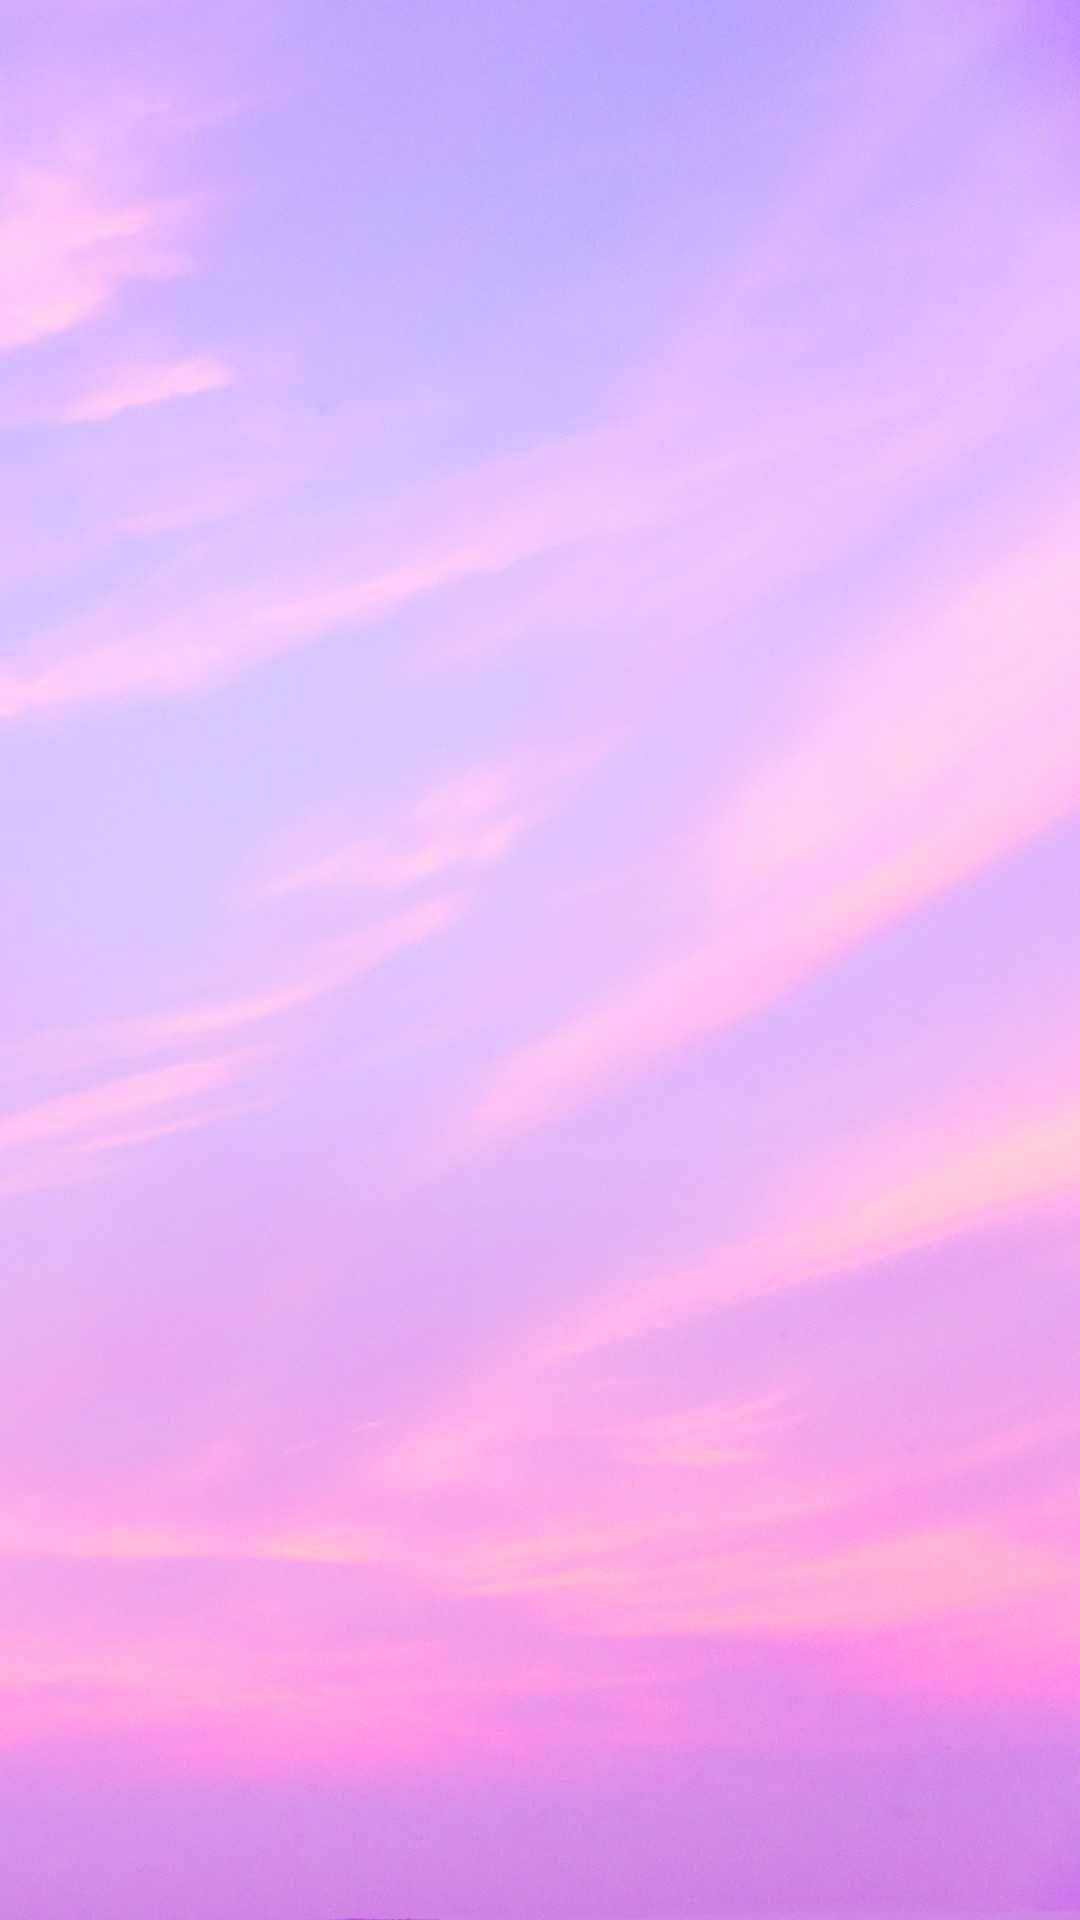 Sky Daytime Pink Purple Horizon Violet In 2020 Purple Wallpaper Iphone Iphone Wallpaper Sky Purple Wallpaper Phone